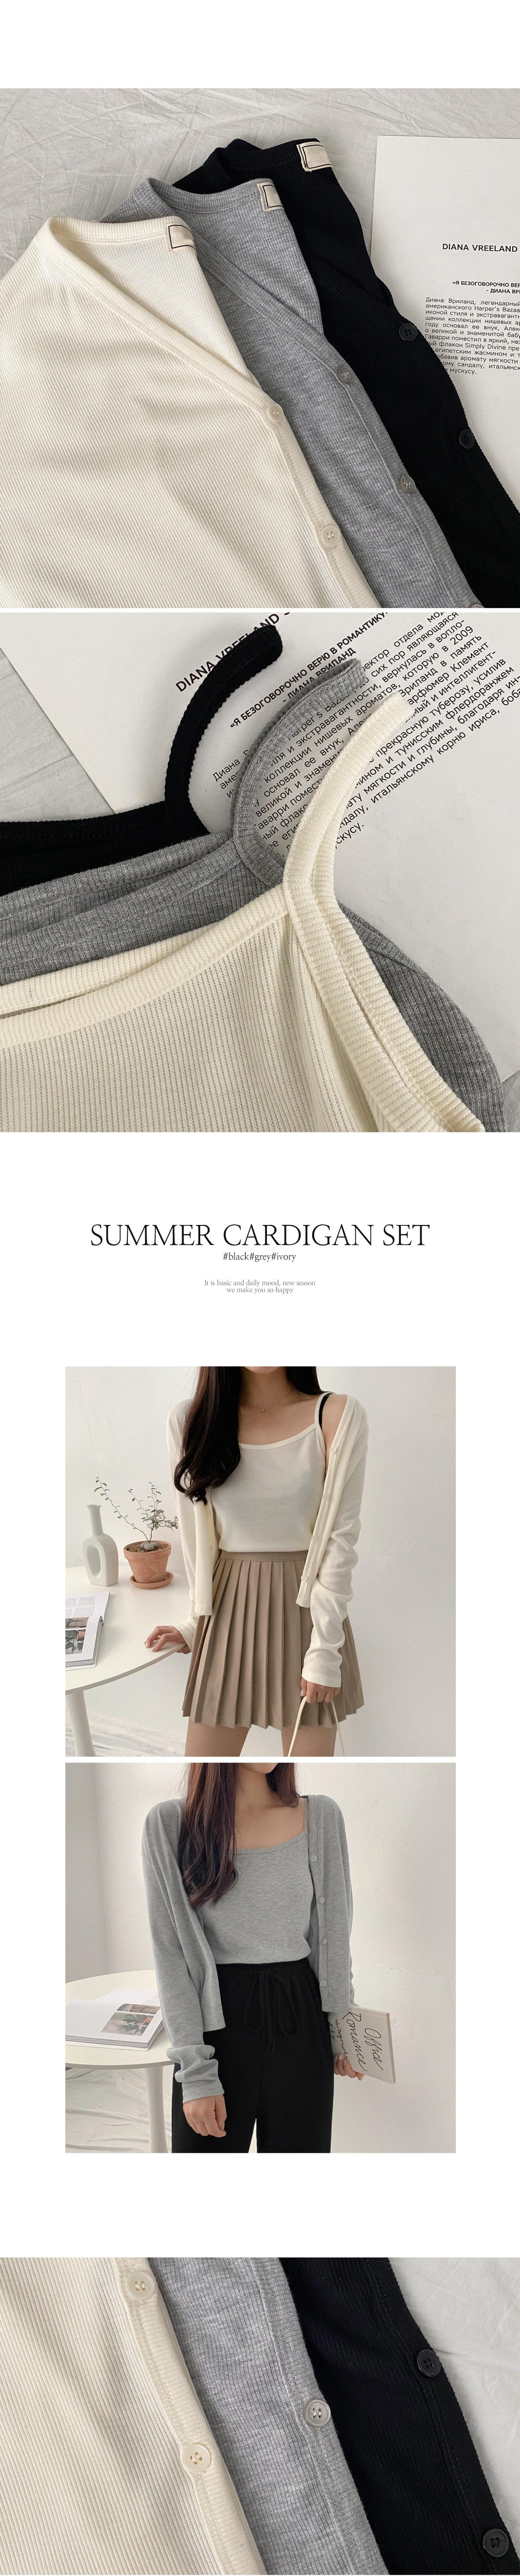 Eti Cardigan Set